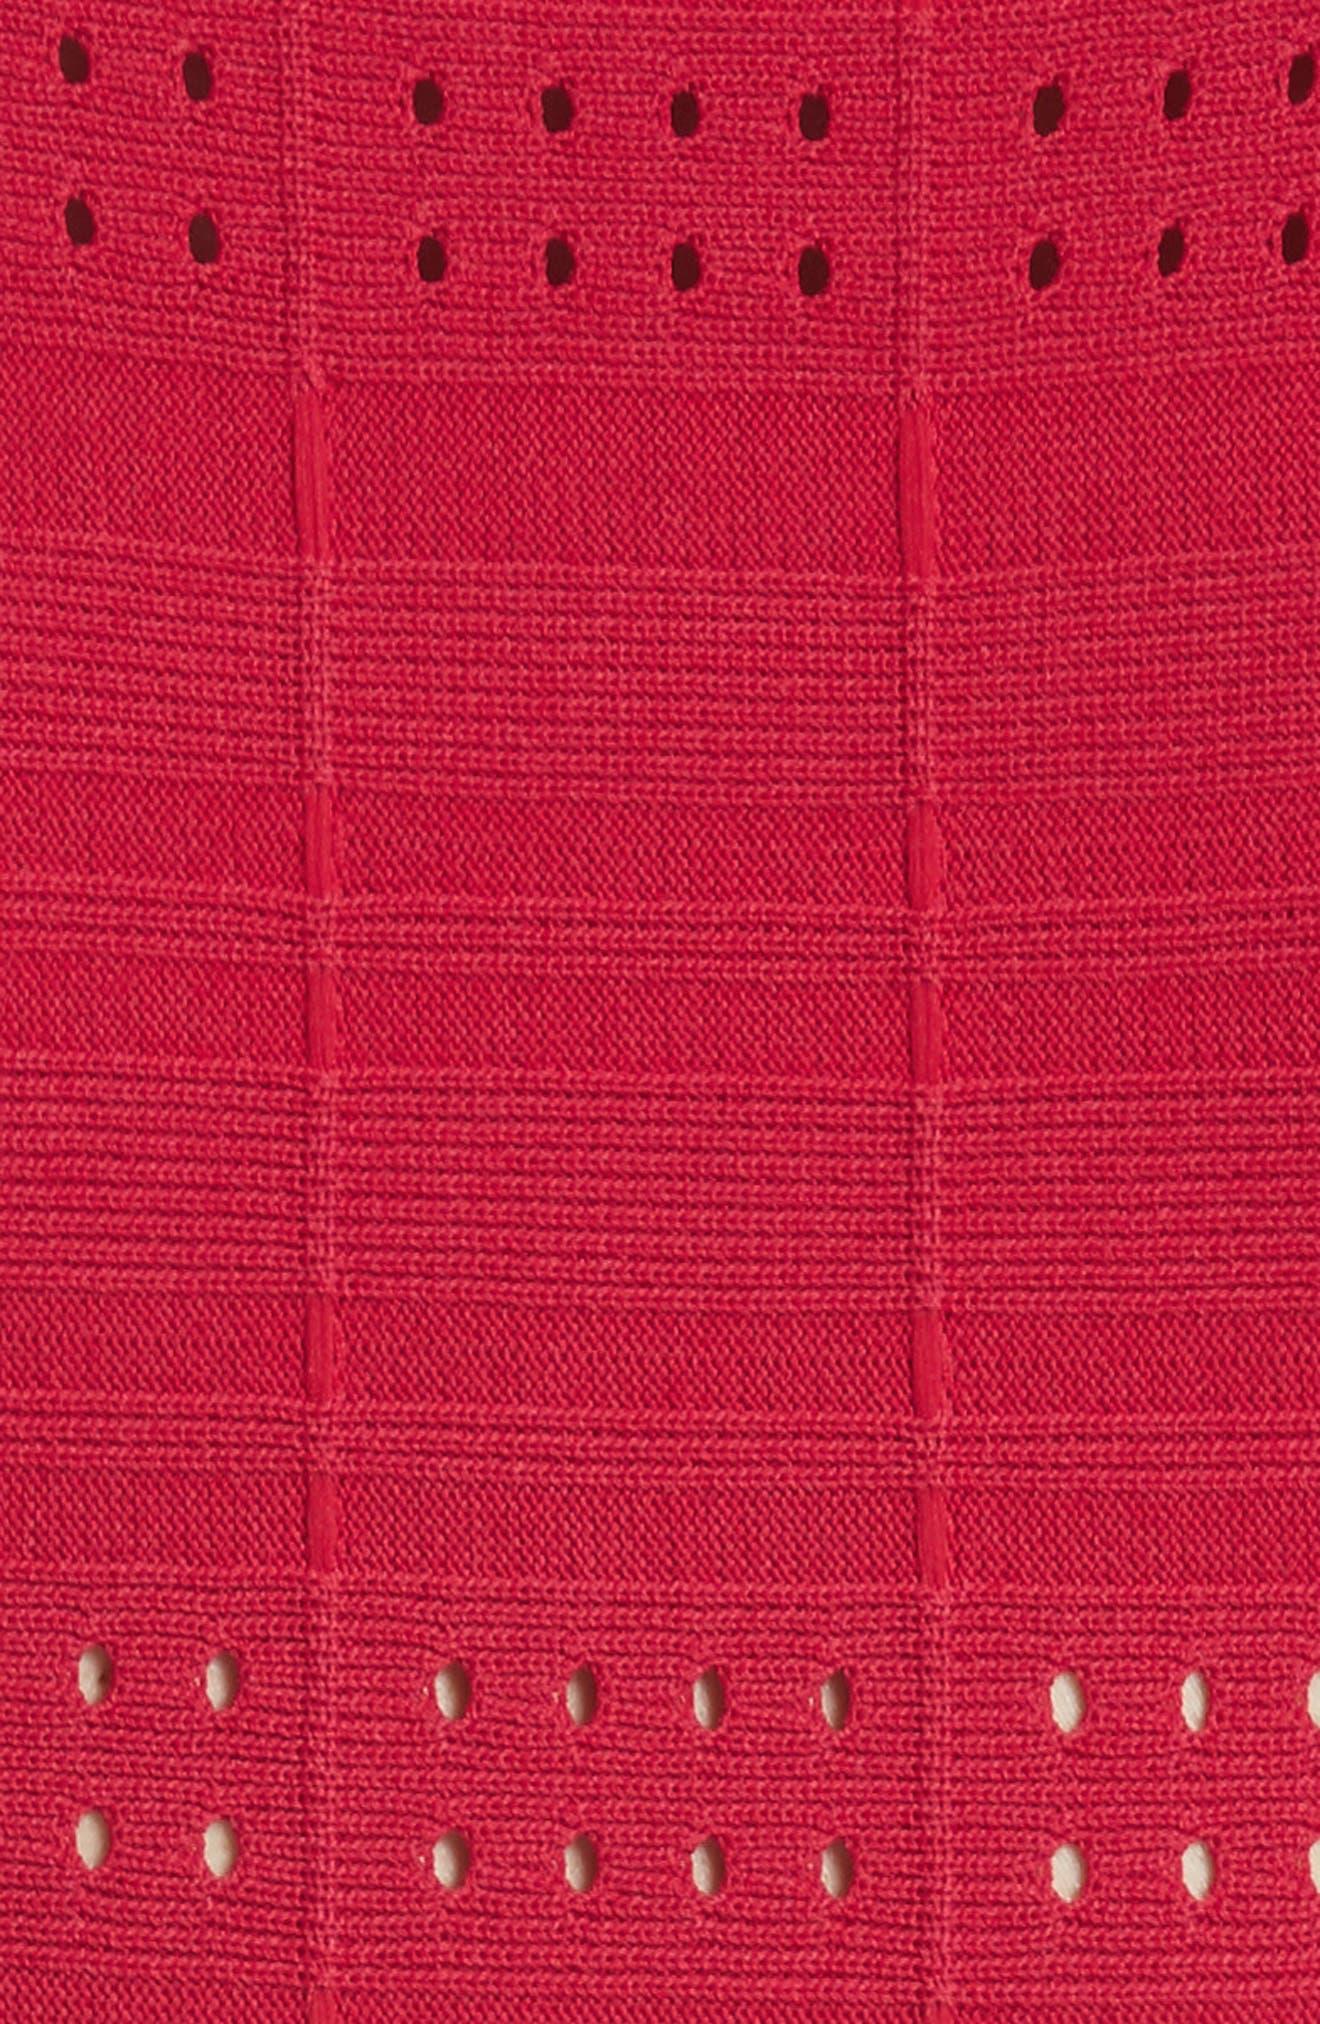 Scallop Trim Knit Dress,                             Alternate thumbnail 6, color,                             620